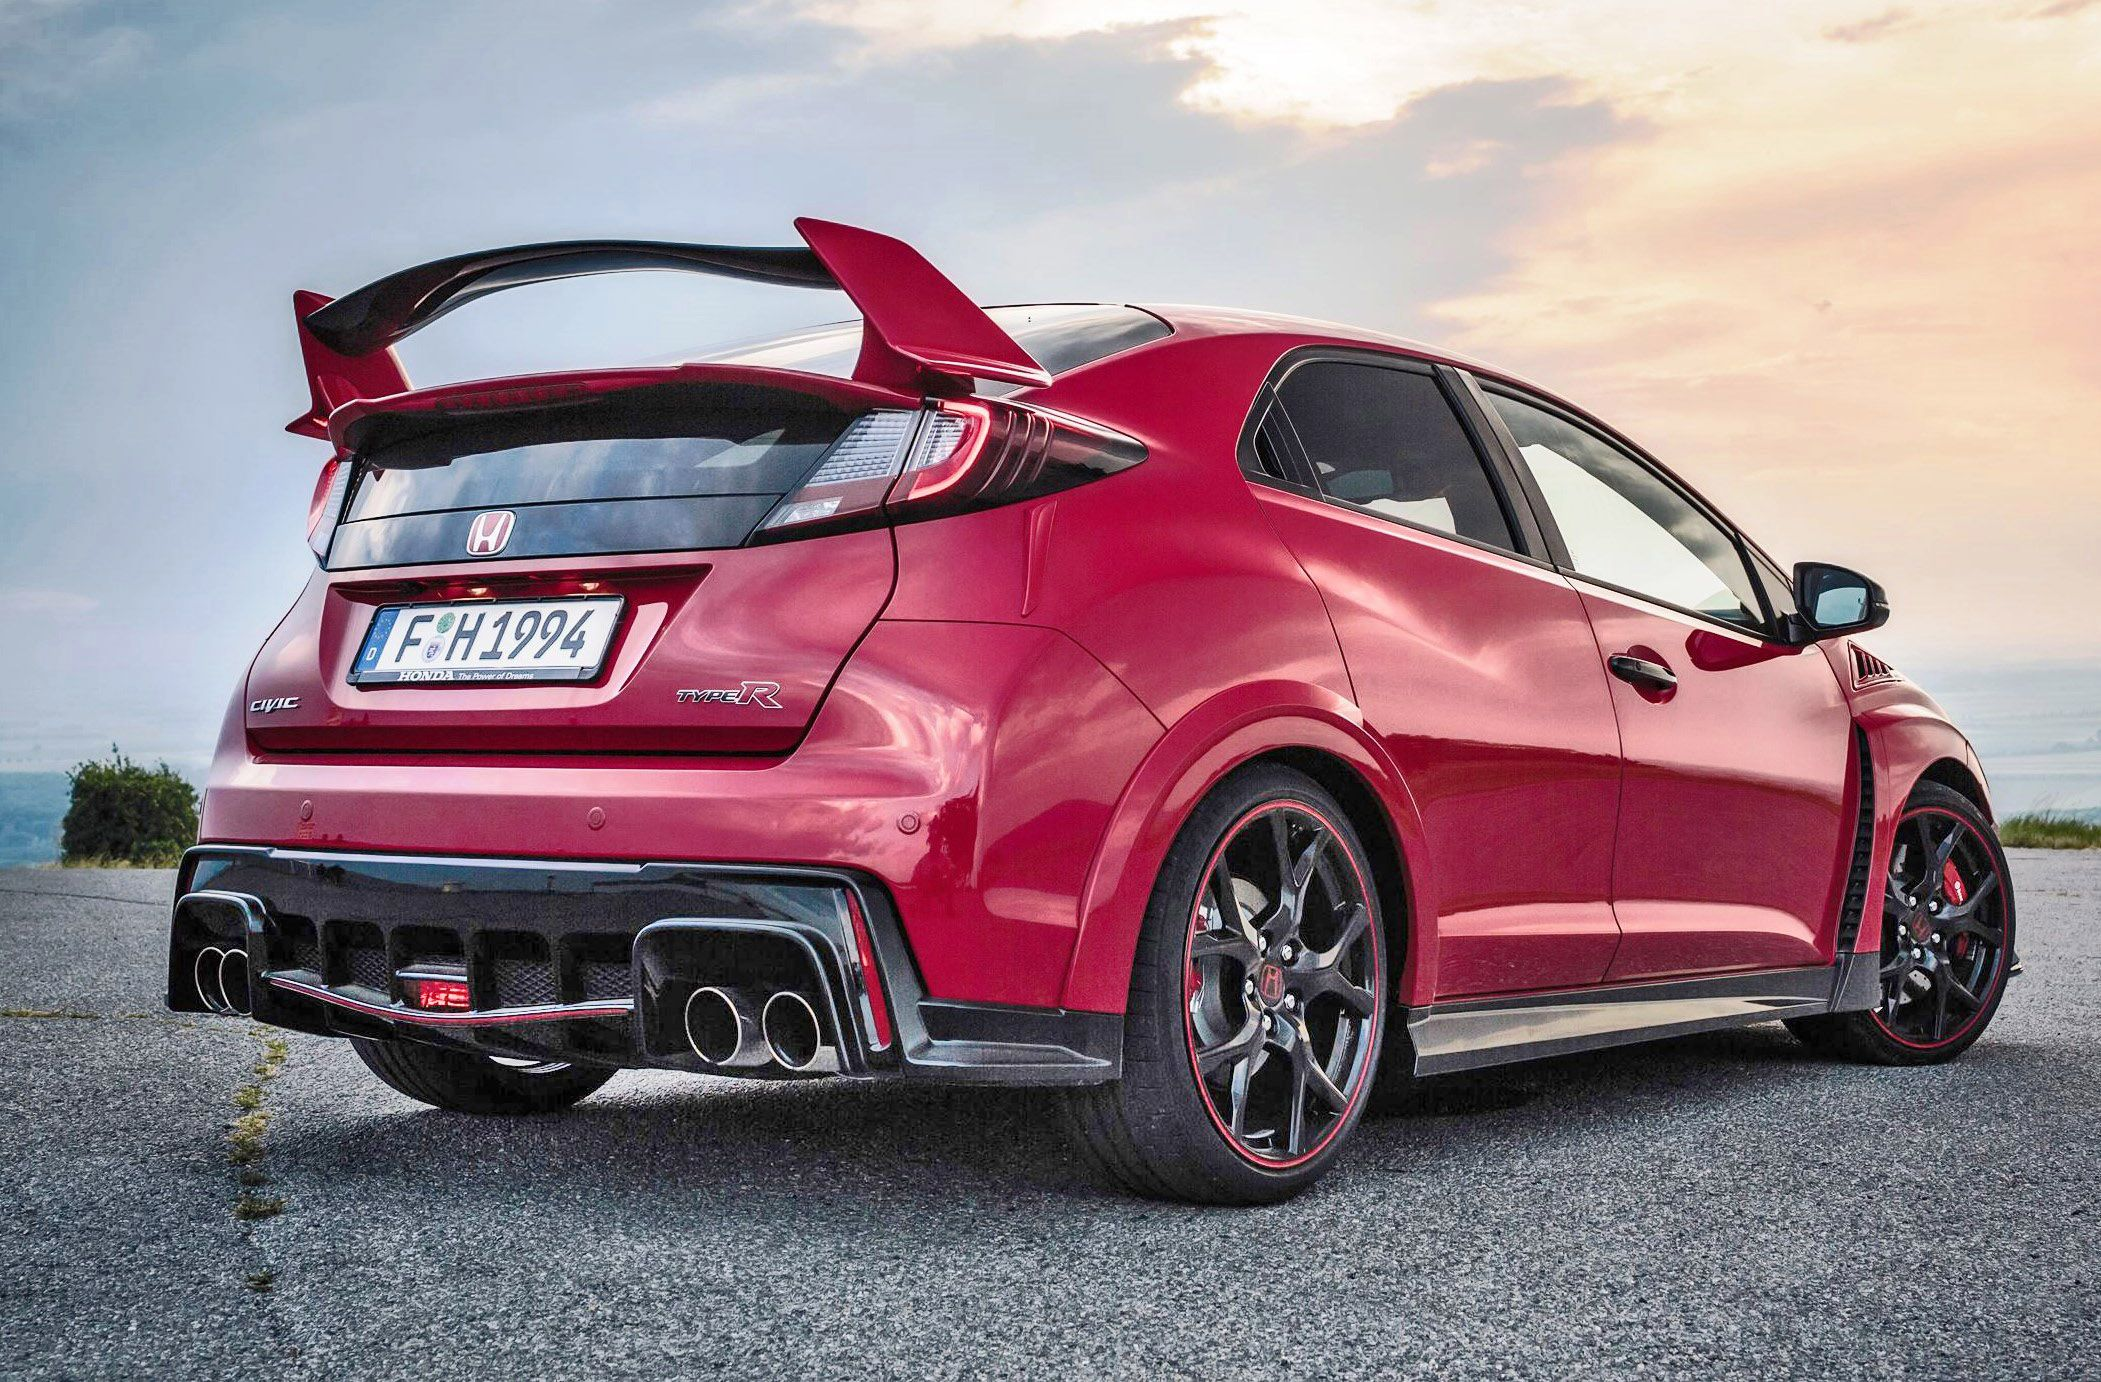 2015 Honda Civic Type R European Launch Gallery in 104